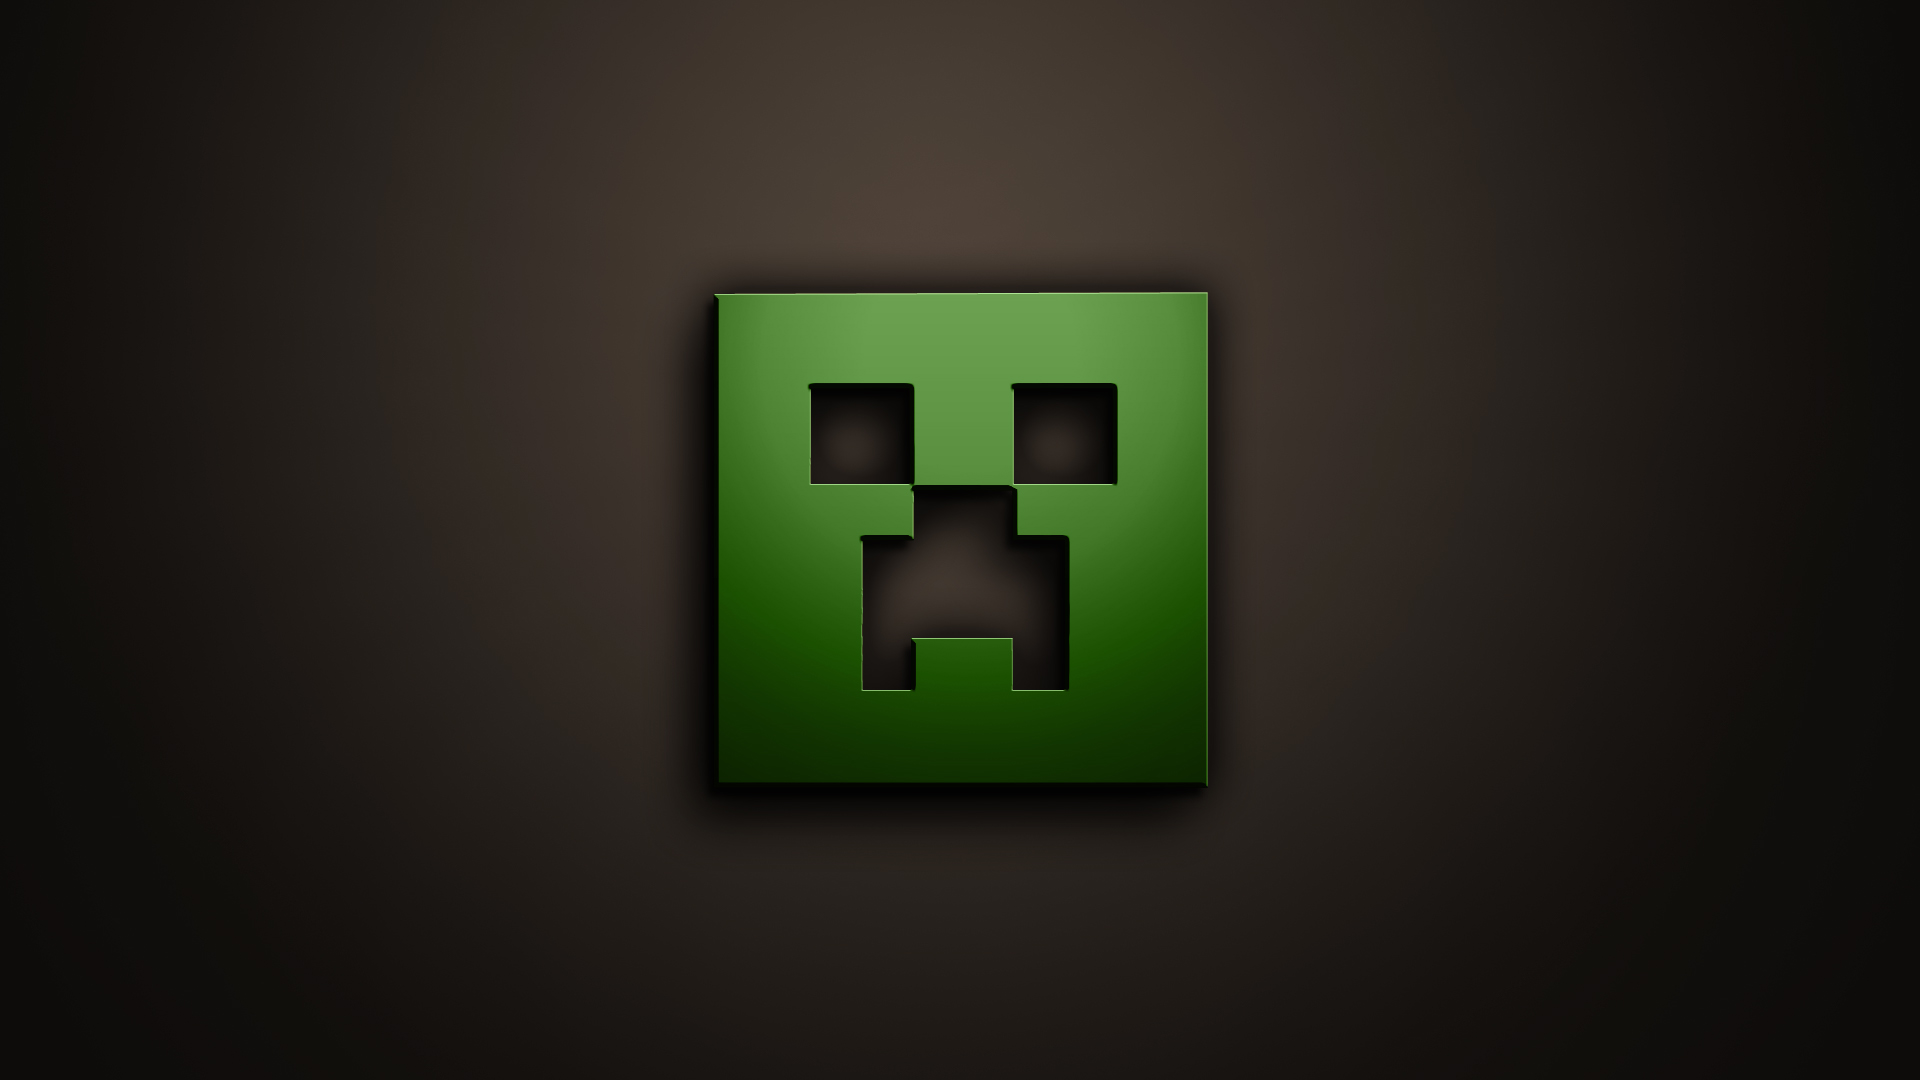 Download Wallpaper Minecraft Simple - 463511  Image_282741.jpg